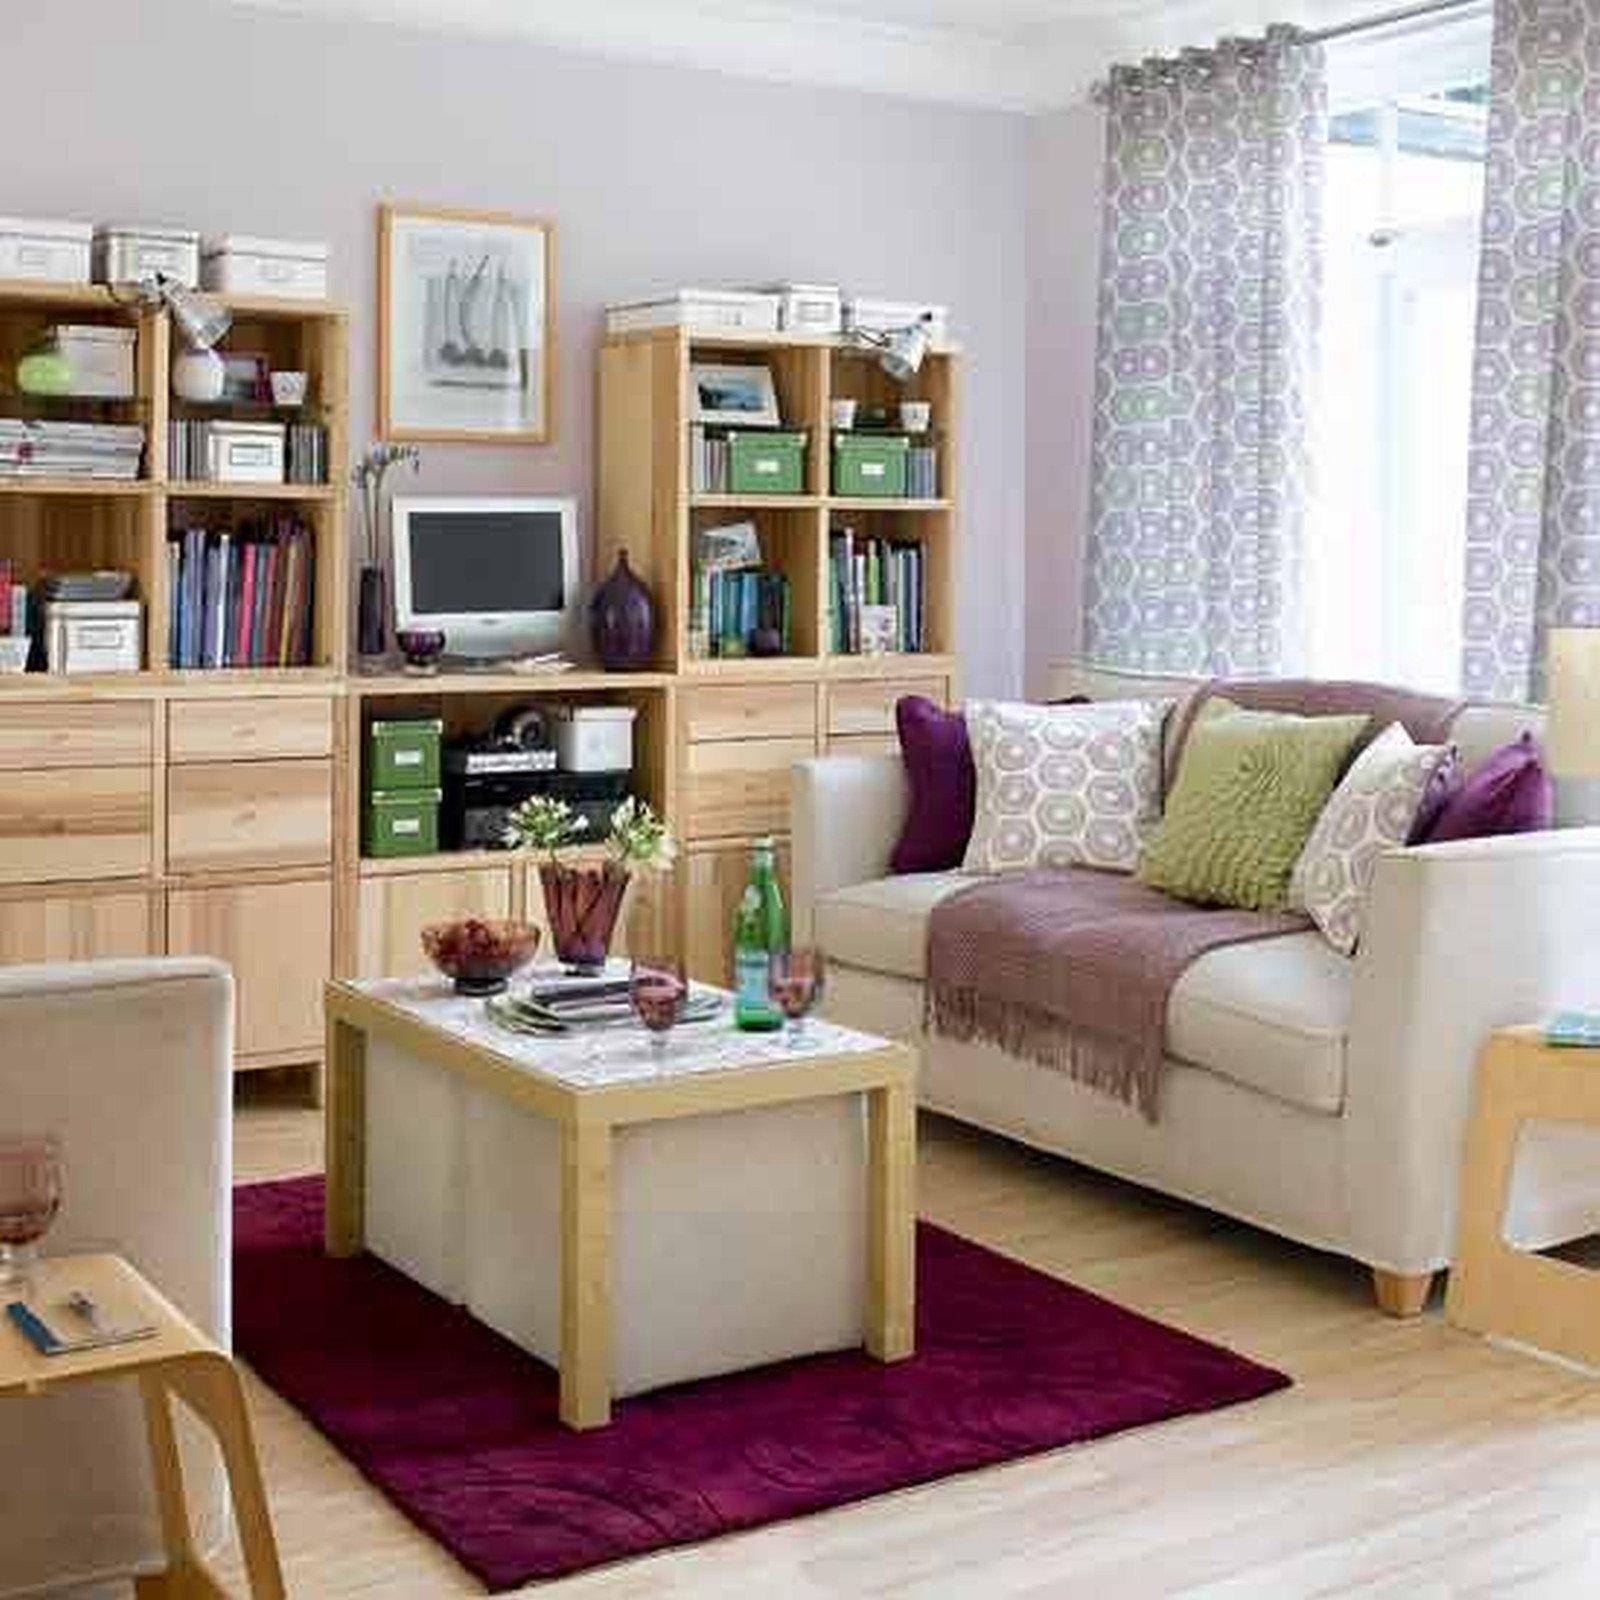 Living Room Furniture Ideas Luxury Small Living Room Furniture Ideas Living Room Designs